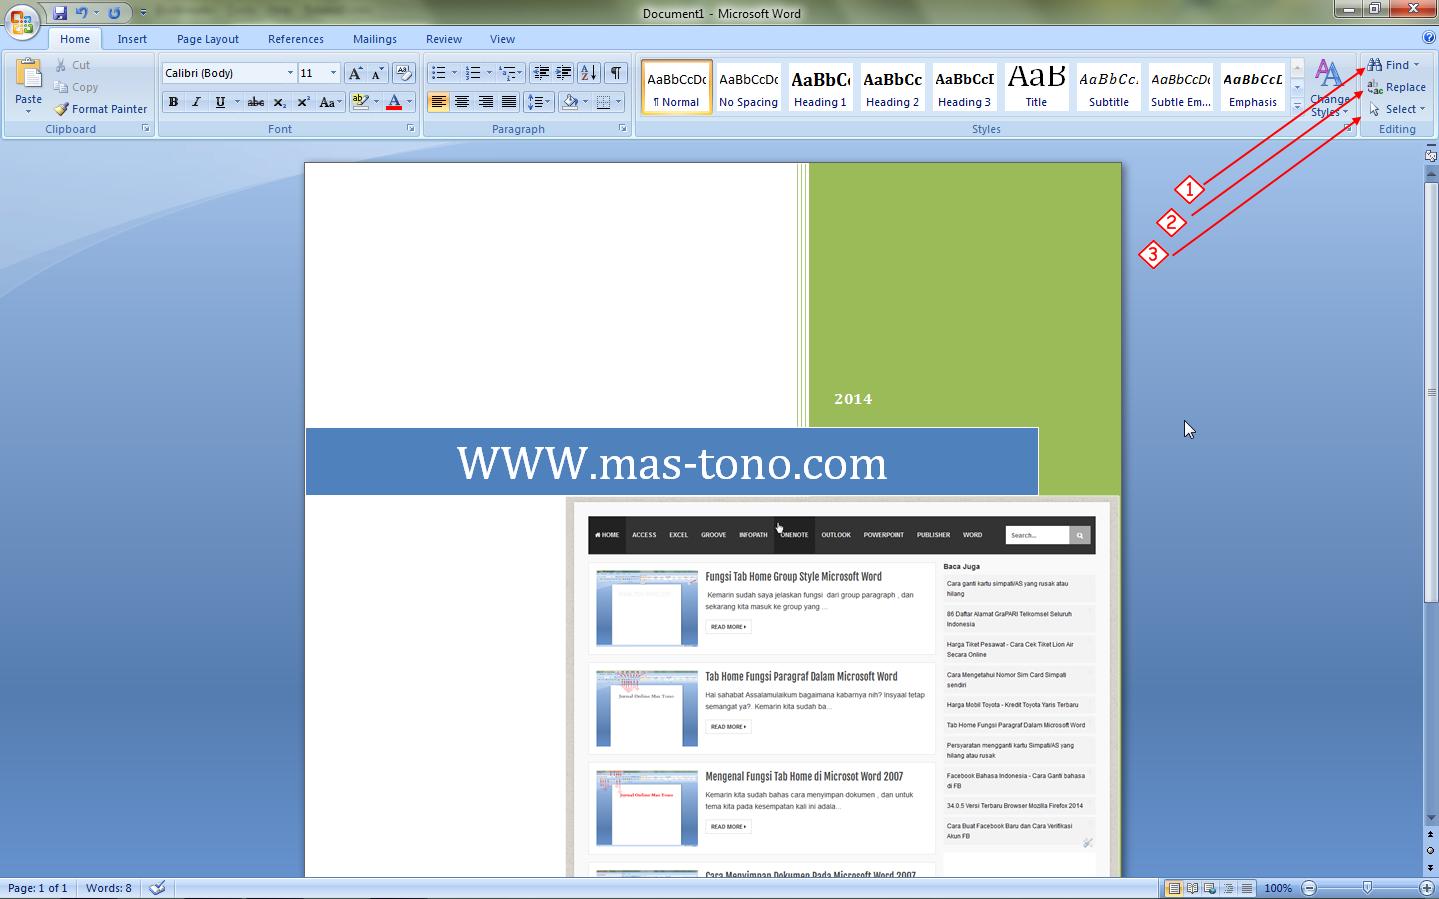 jelaskan fungsi office button pada microsoft word 2007